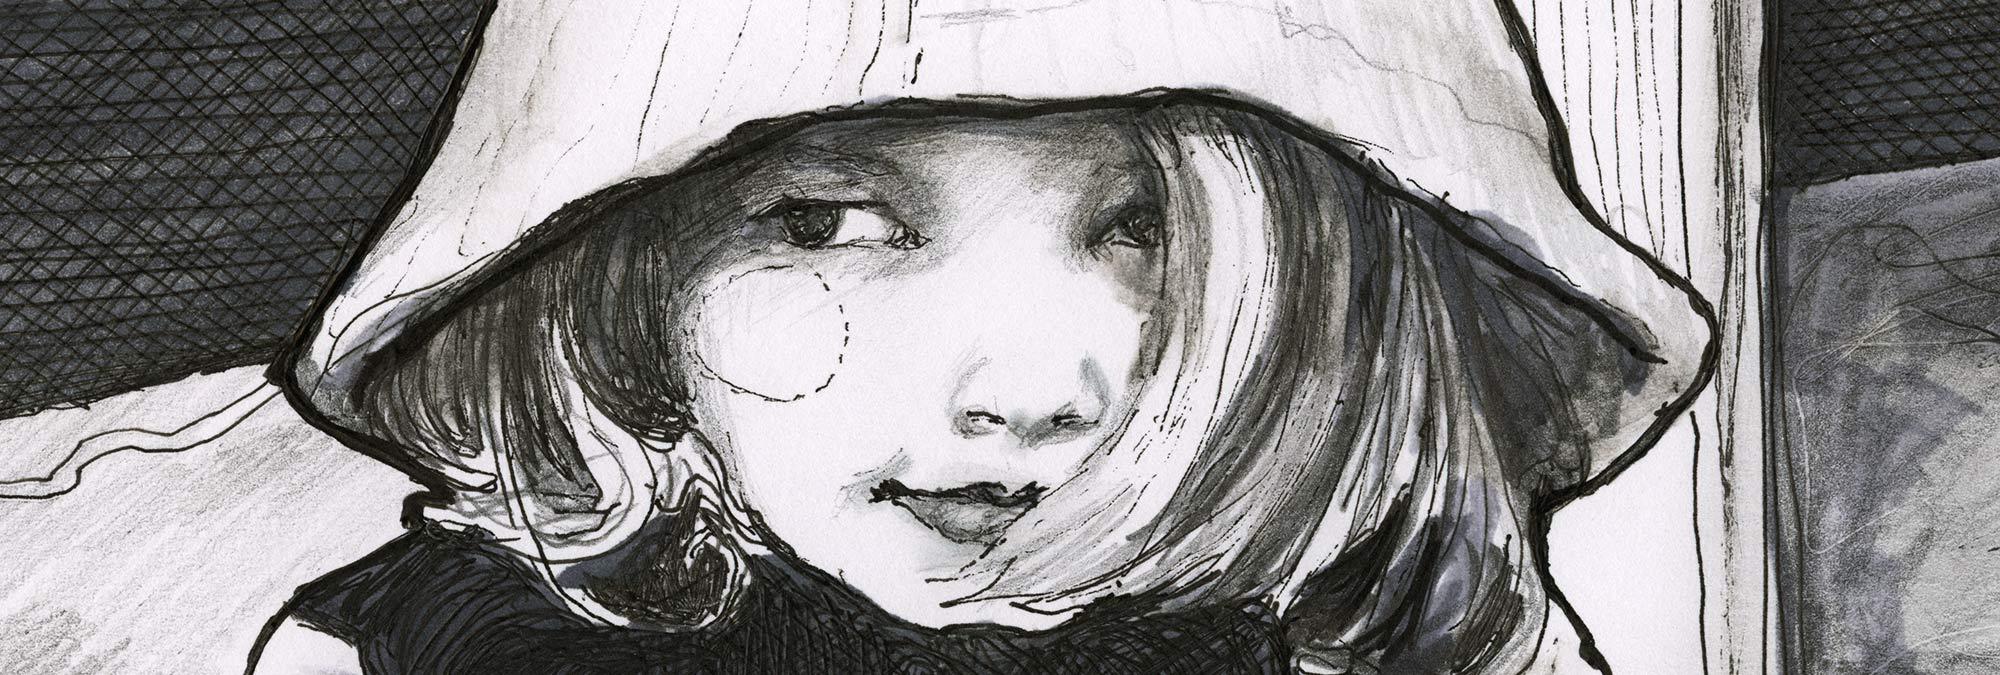 Close up of Artist Danny Roberts Pen drawing of Scarlett King 画家ダニー・ロバーツによるスカーレット・キングの拡大図